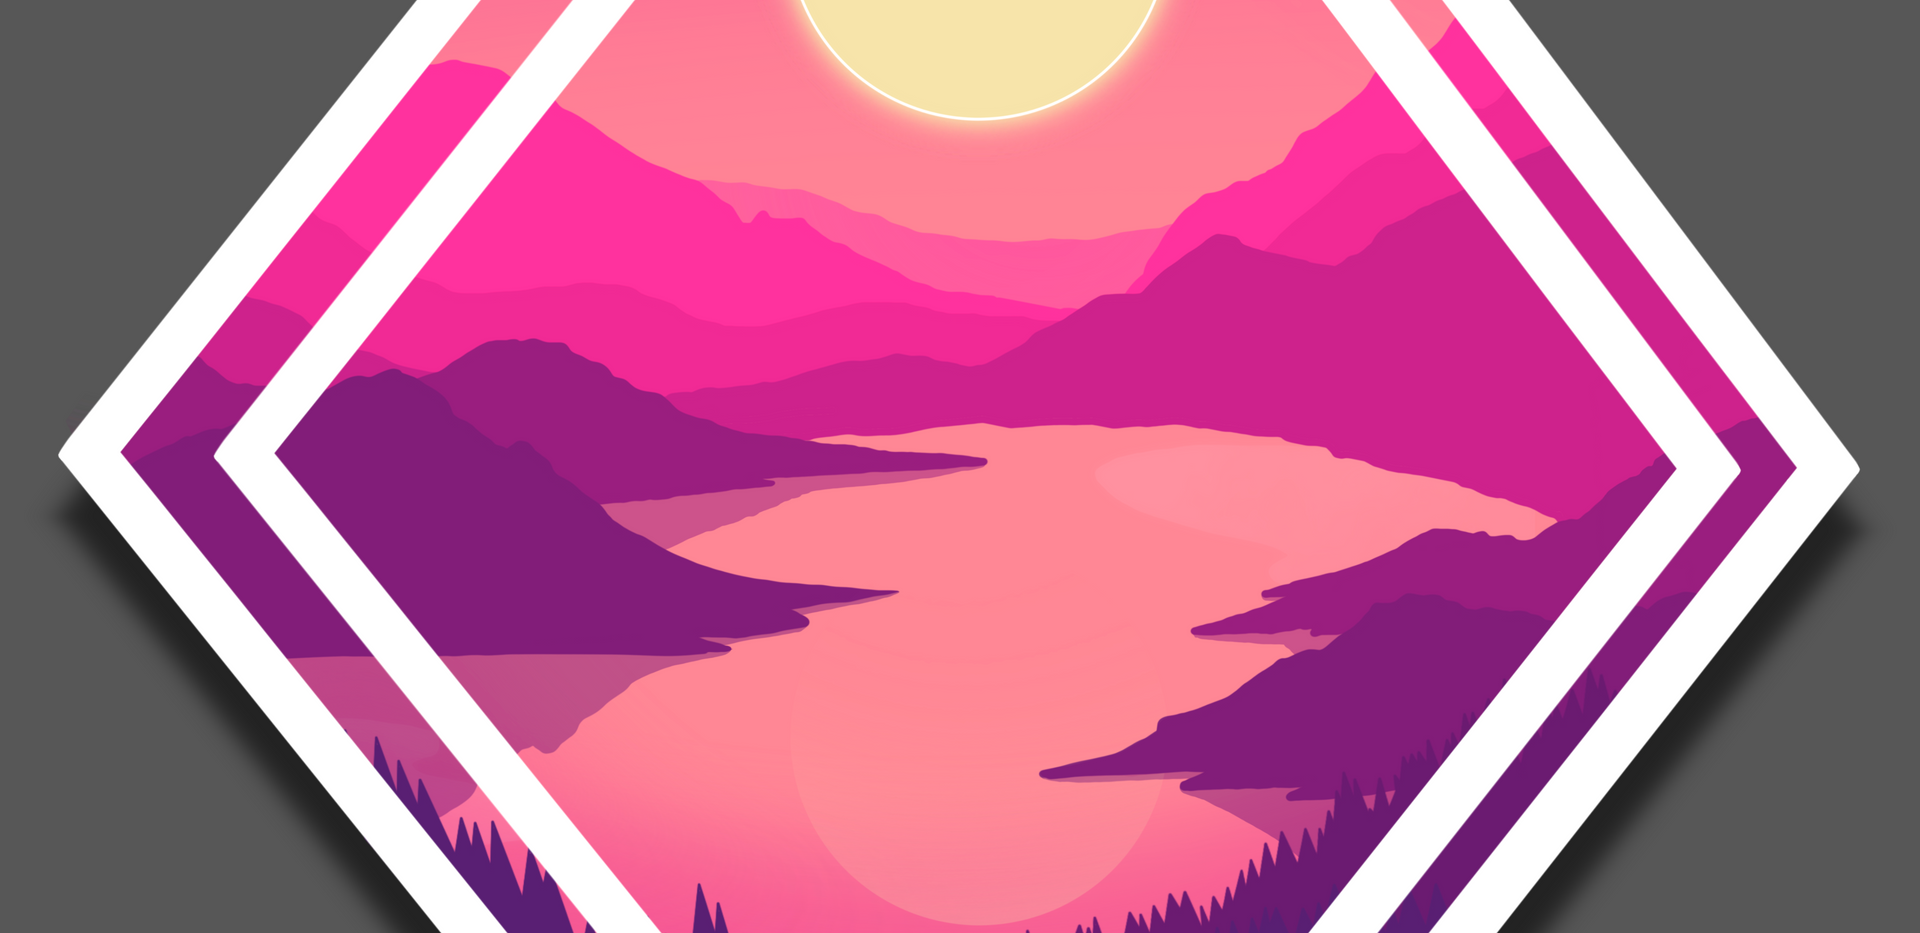 Vaporwave Sunset 2